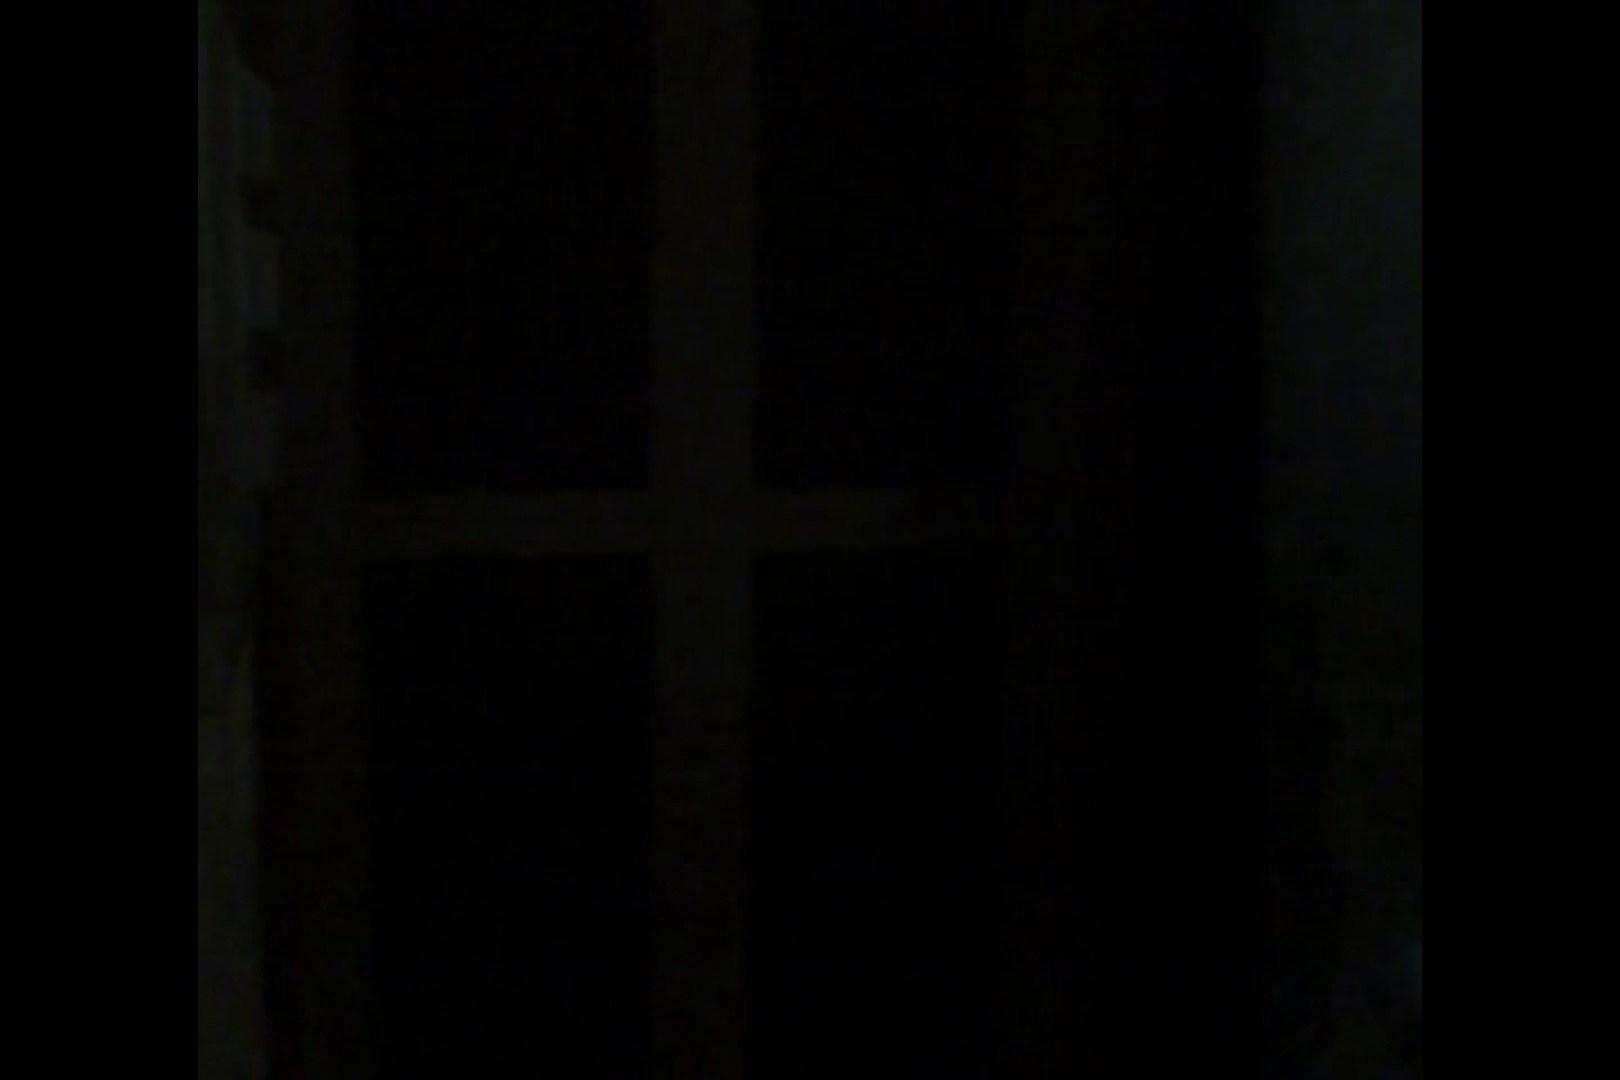 Came back チンピースさん!!vol.01 スリム美少年系ジャニ系 尻マンコ画像 109連発 28